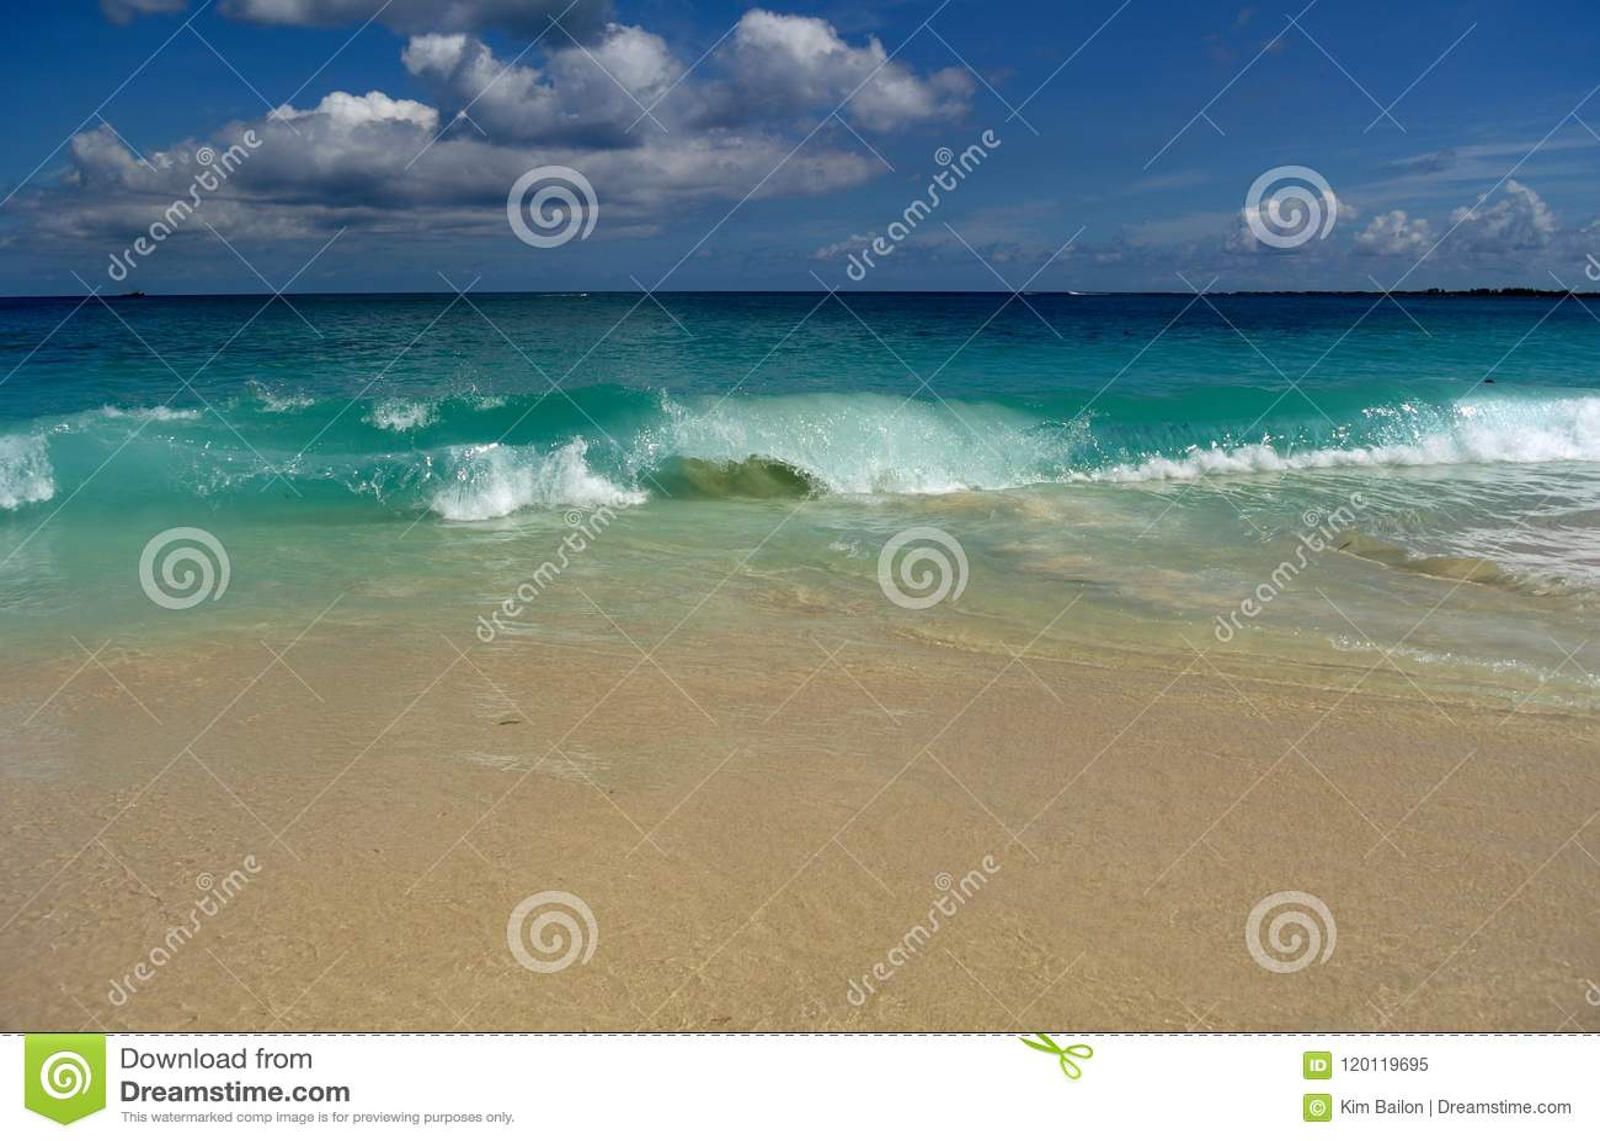 Bahamas beach waves curled crash